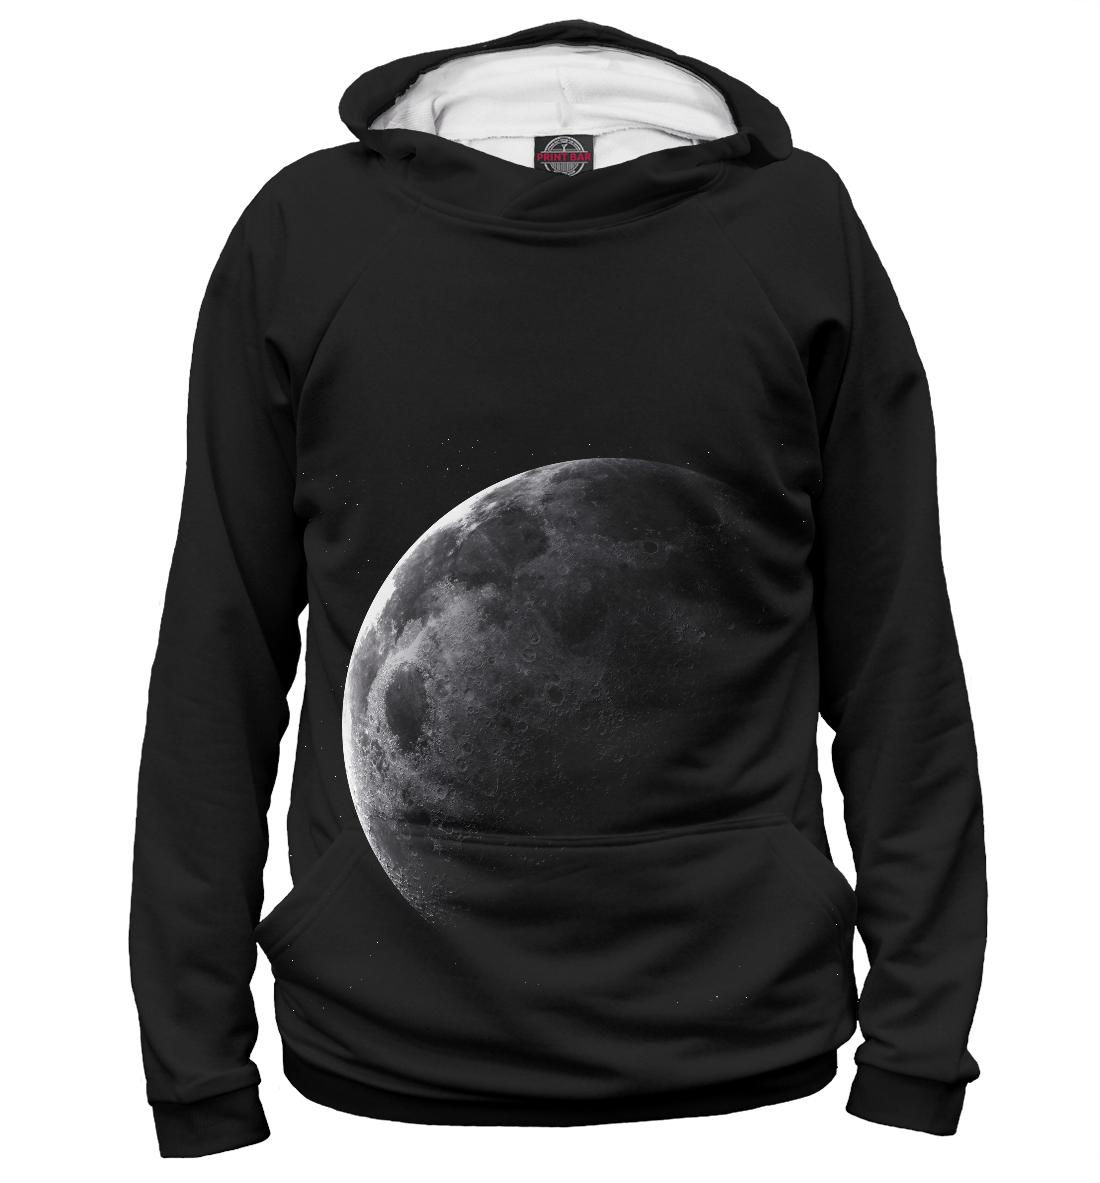 Фото - Луна евгений федотов луна часть 2